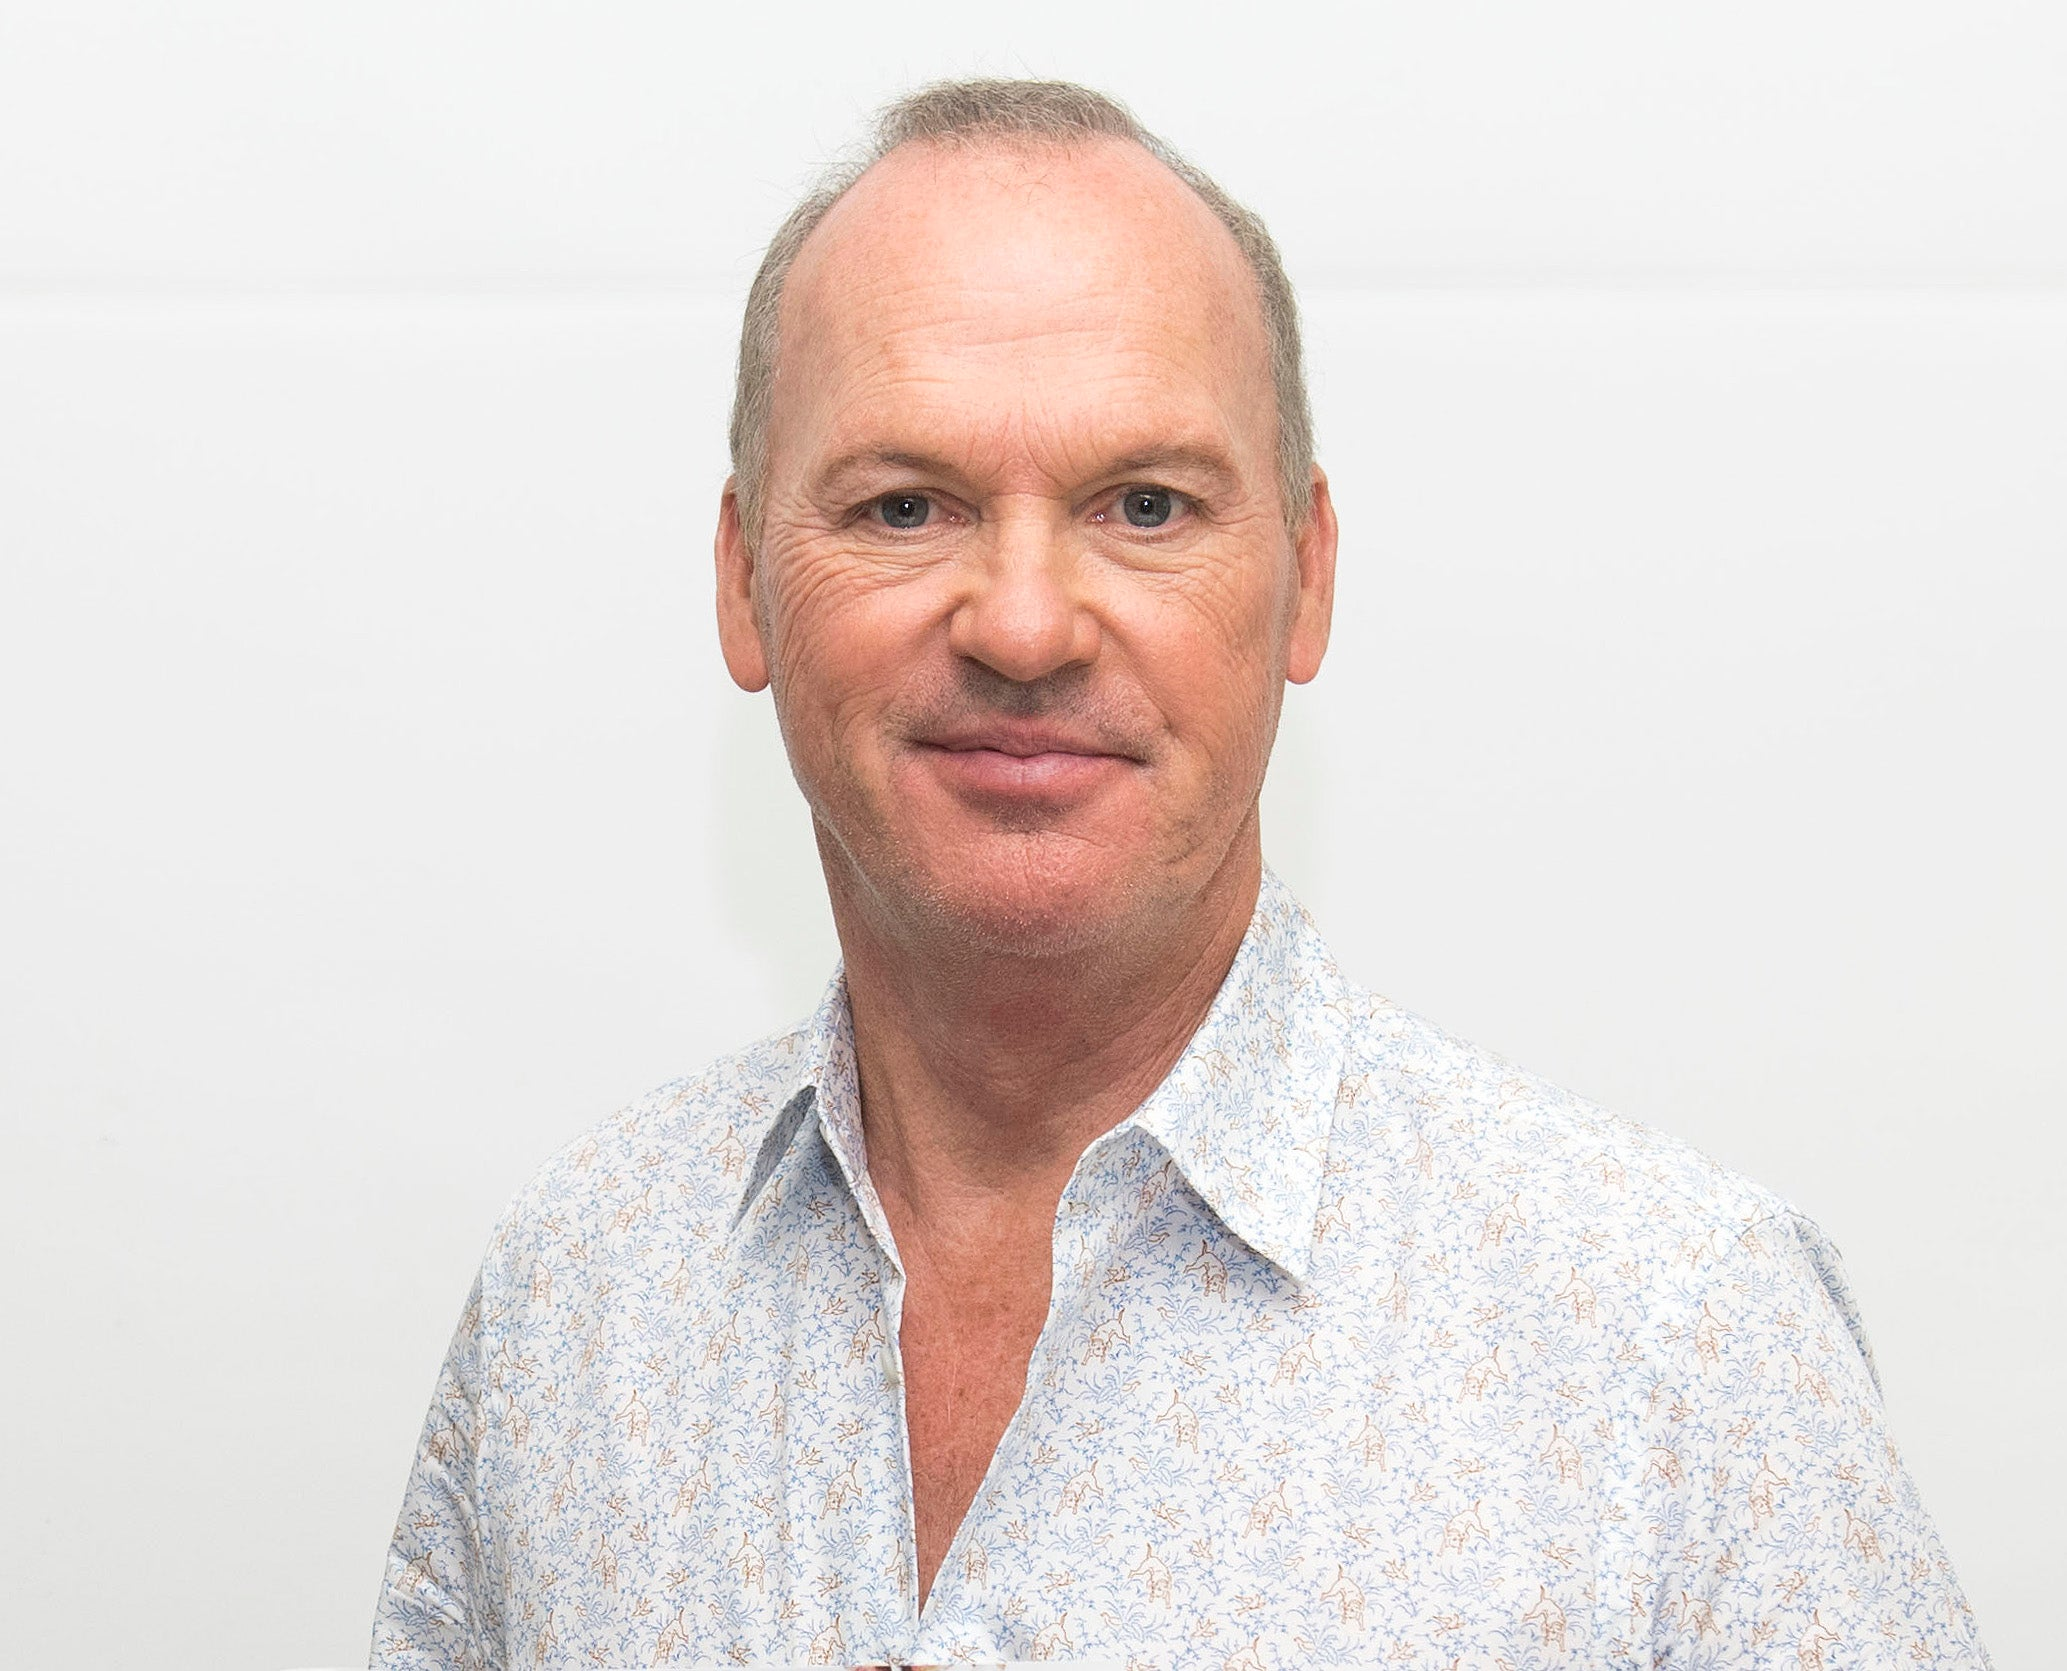 Actor Michael Keaton. Golden Globe winner